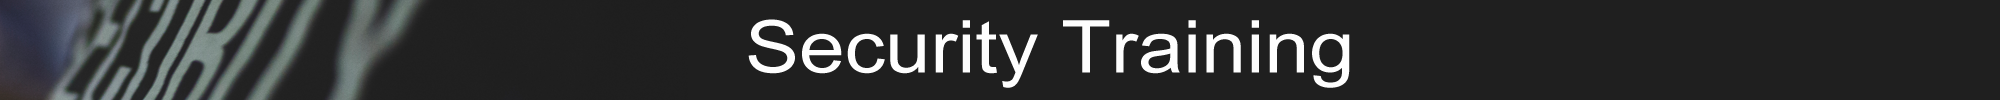 SecurityTraining